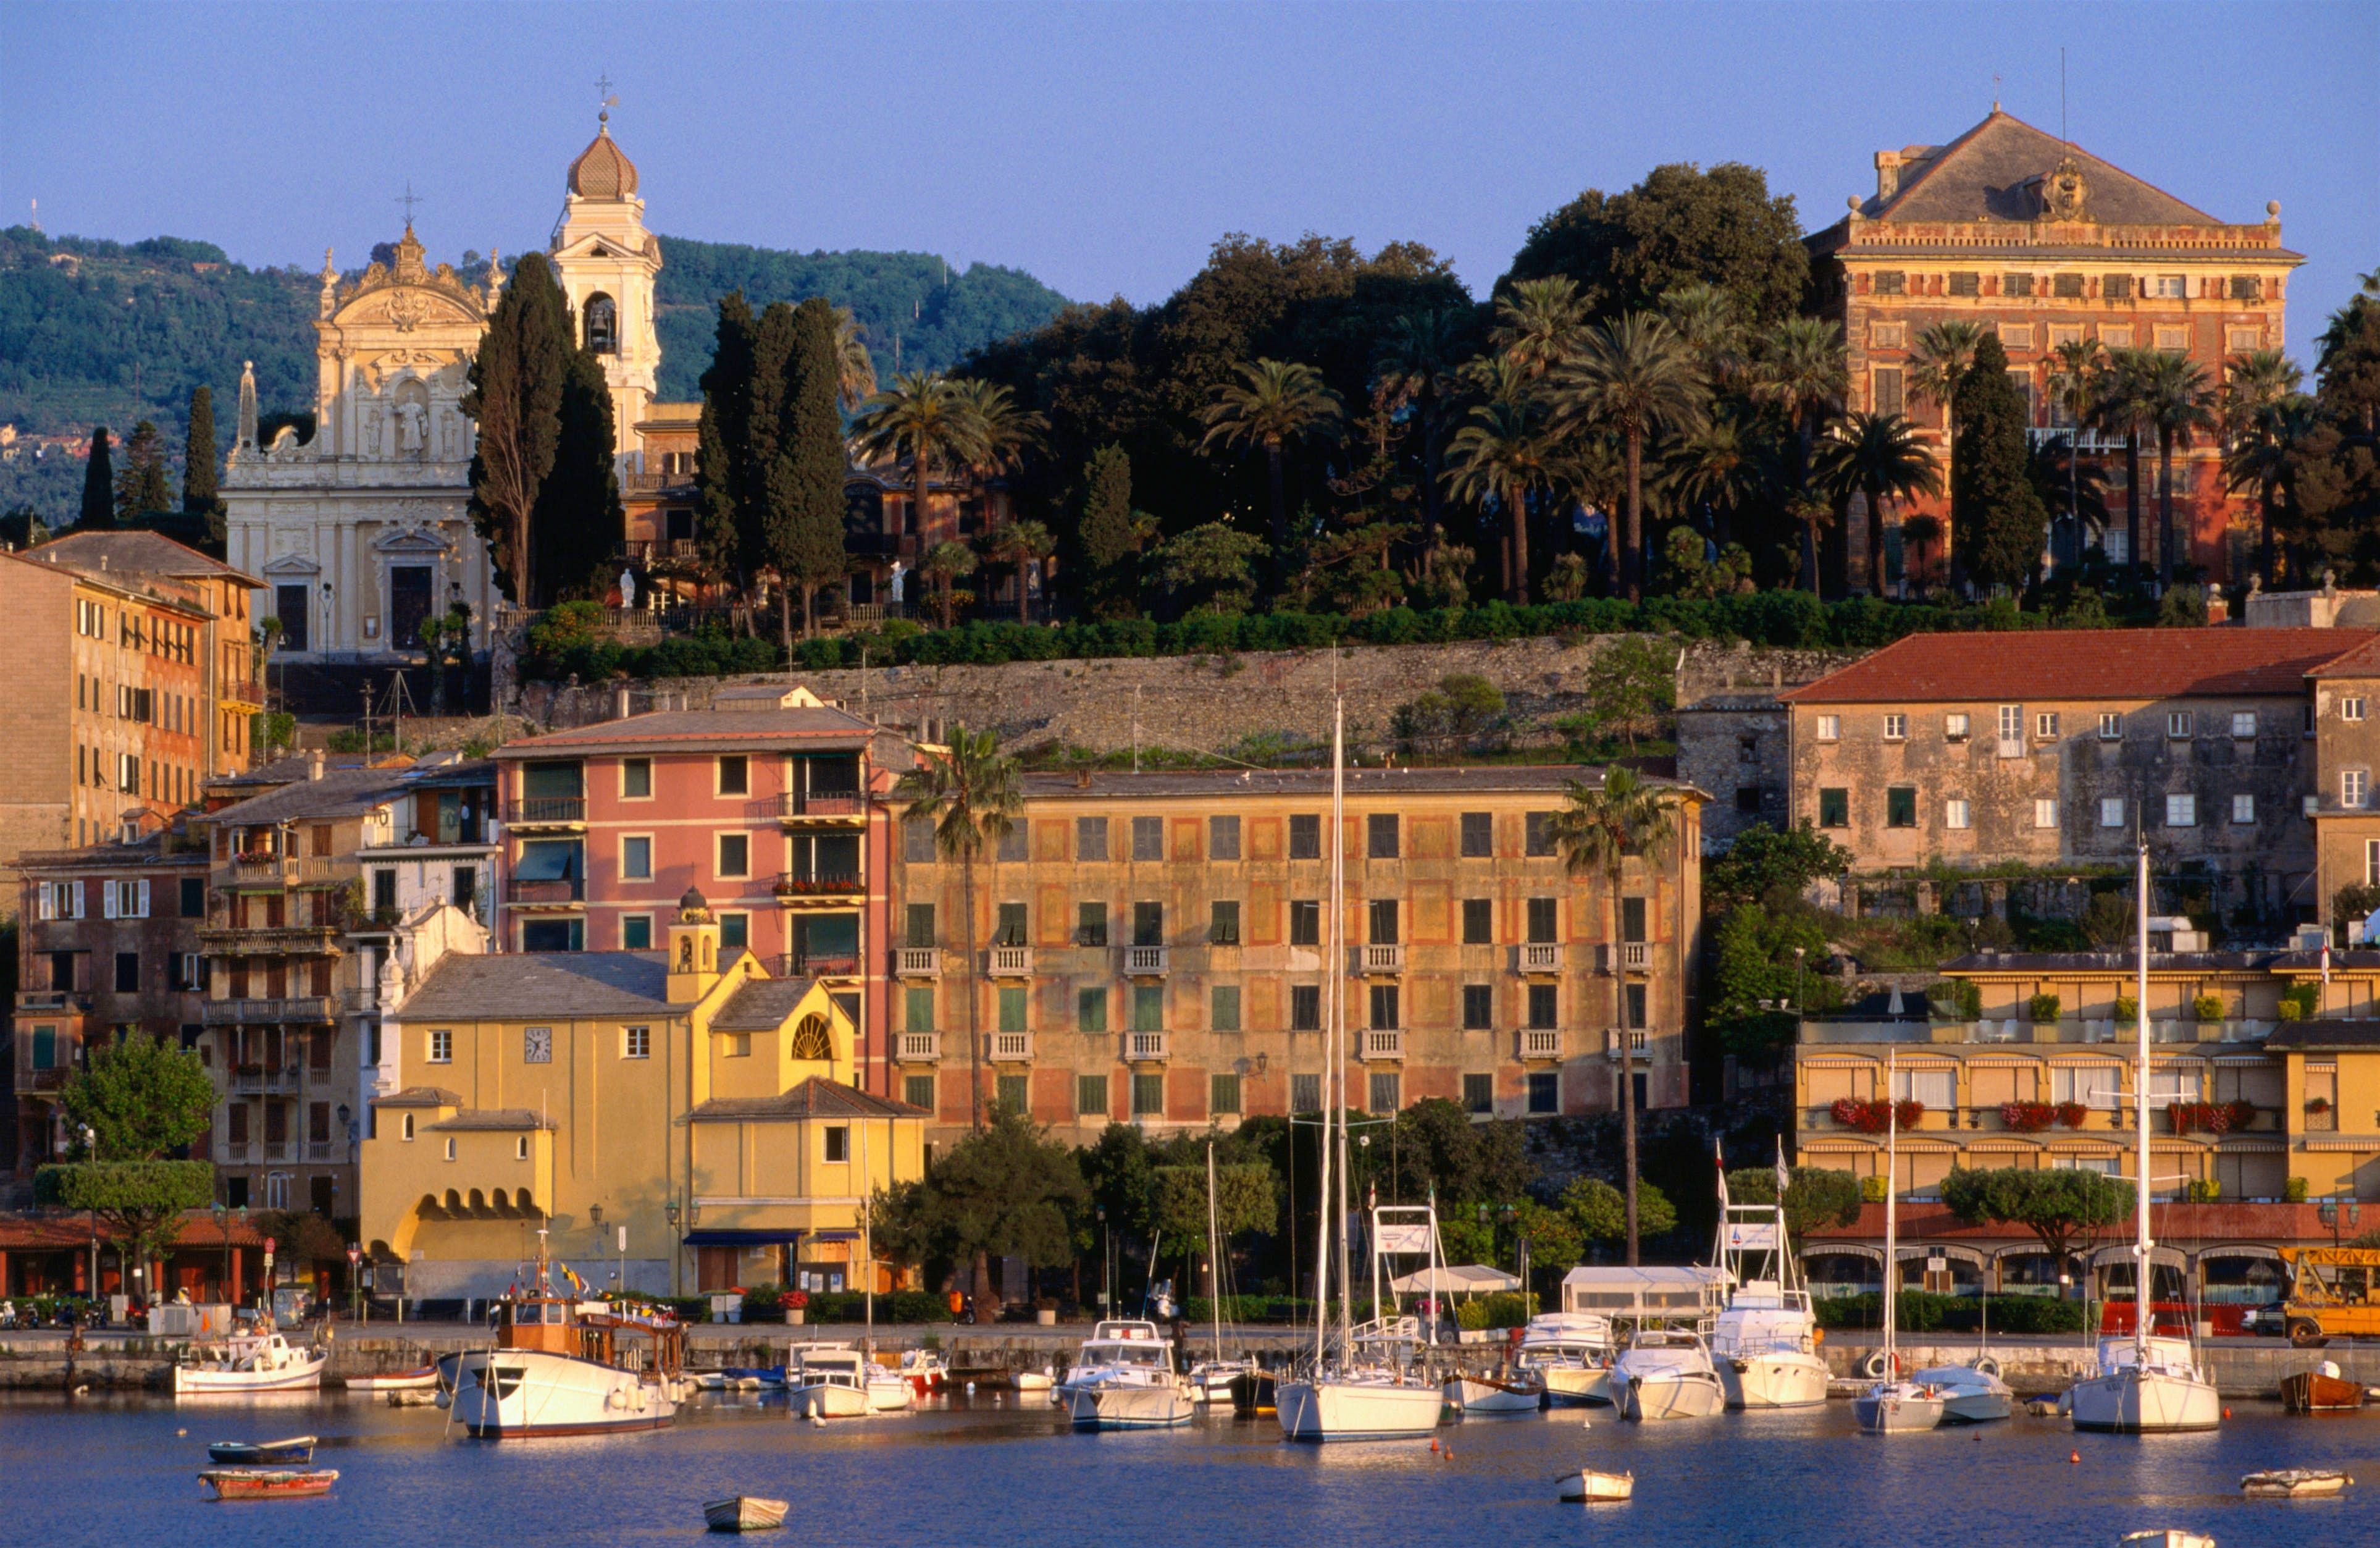 Incontri gay a Santa Margherita Ligure